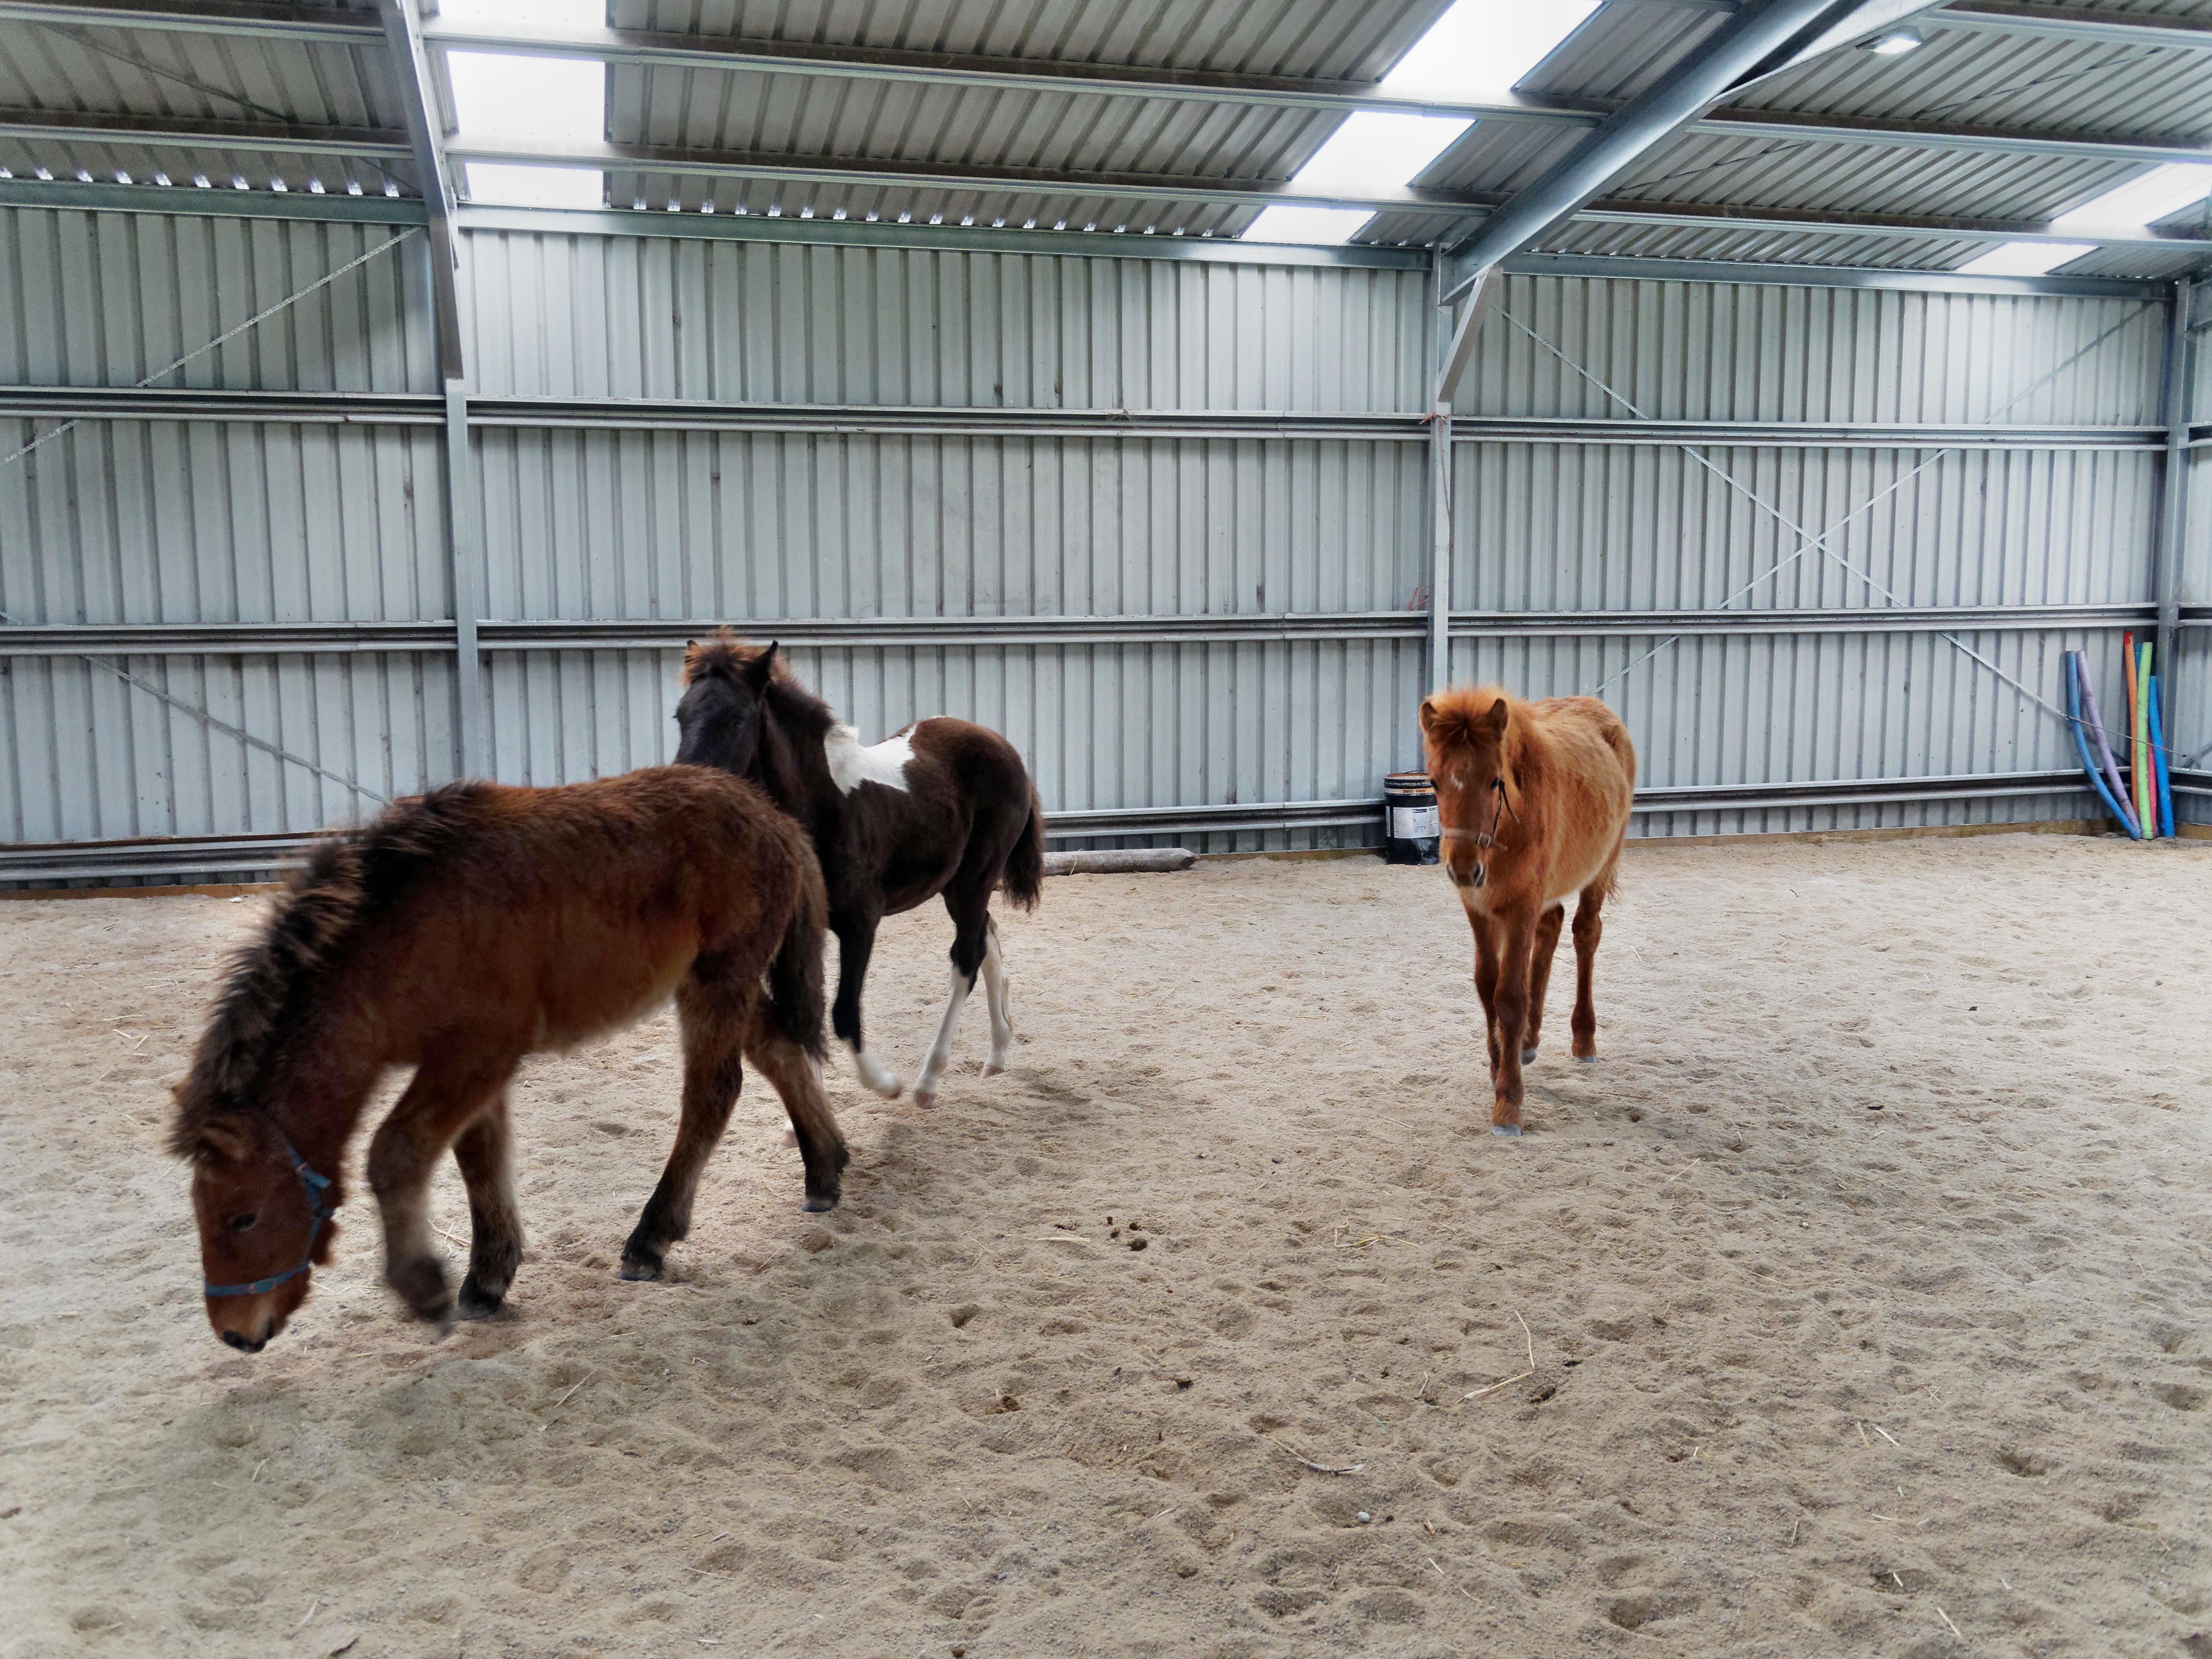 Horses-32.jpeg